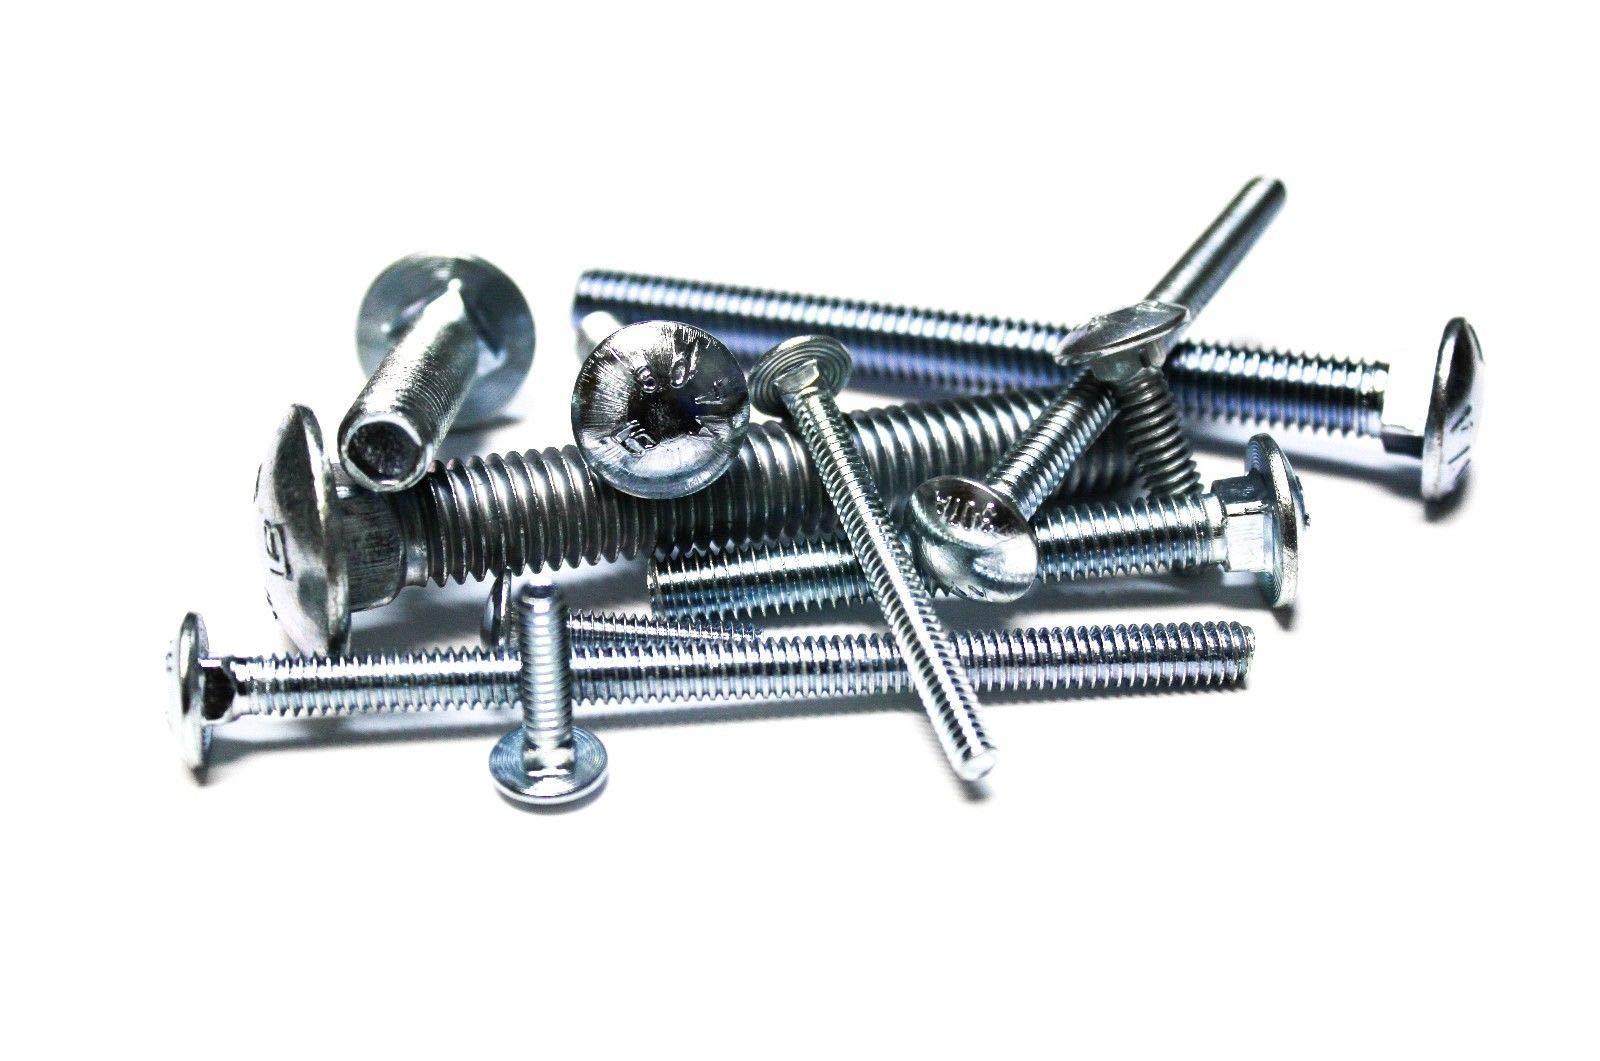 (500 pcs) 1/4''x2'' Carriage Bolts - Zinc Bolts Assortment Kit Set